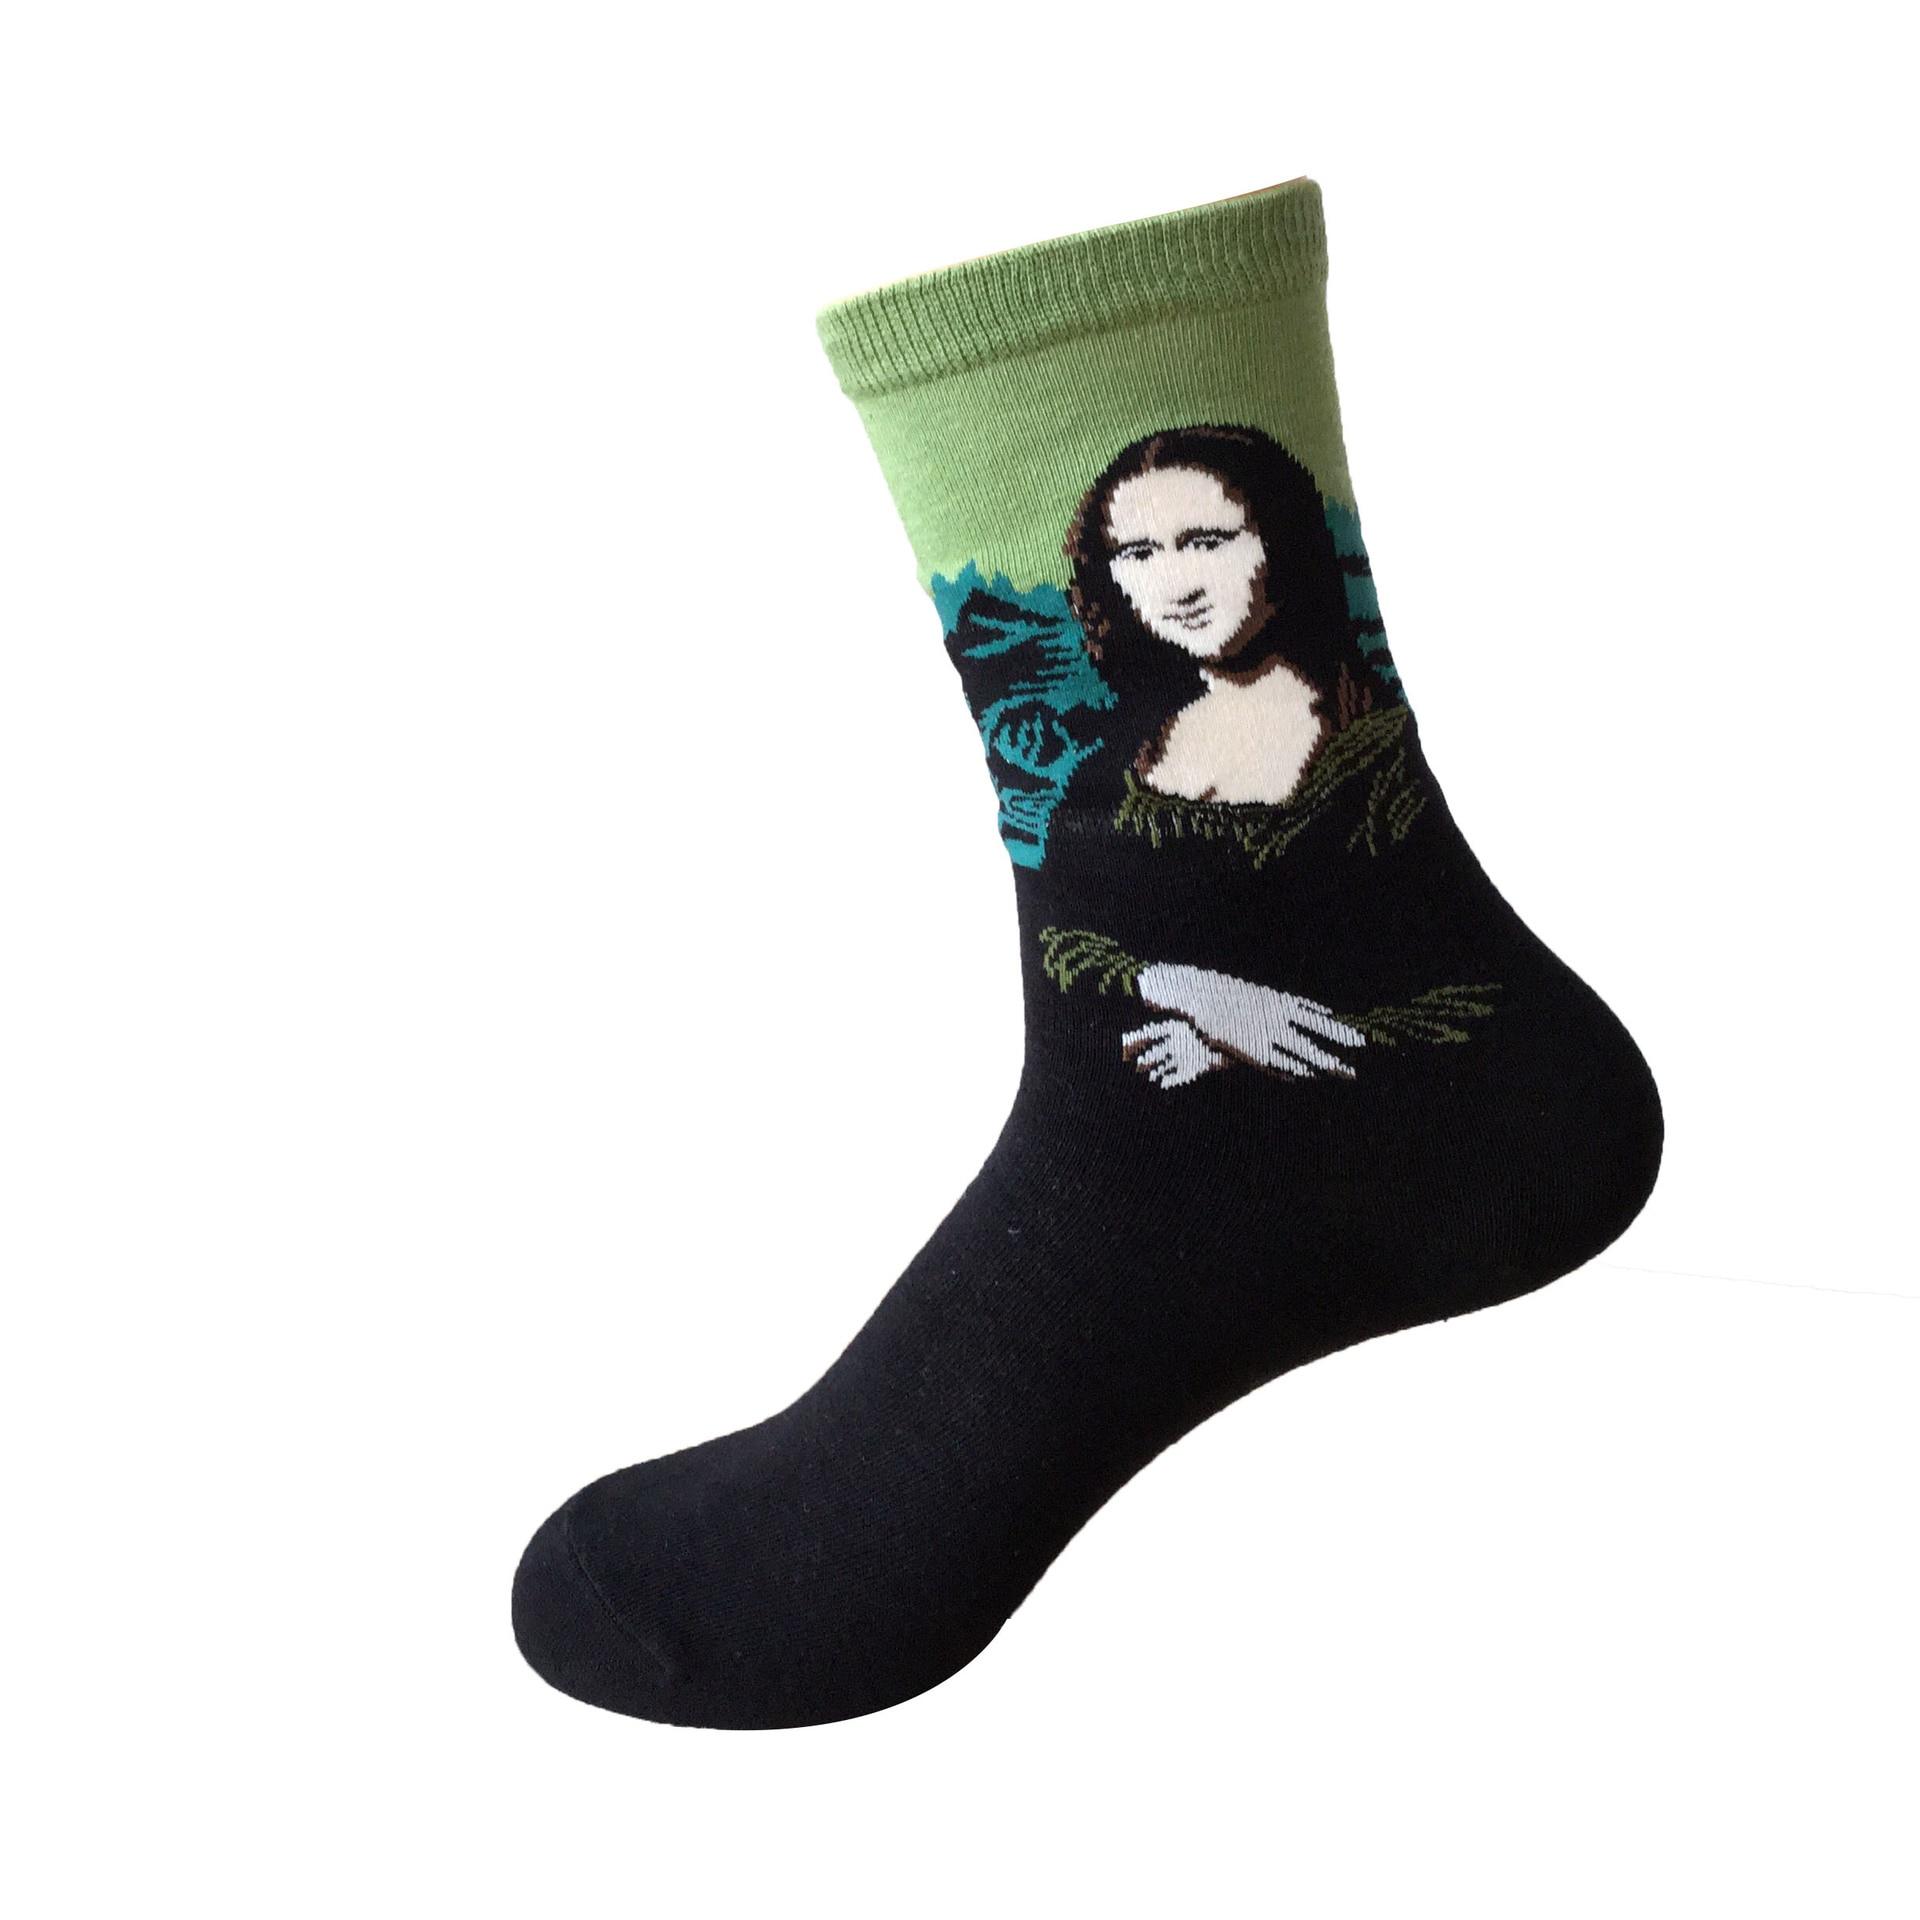 NEW Fashion 3D Retro Painting Art Socks s